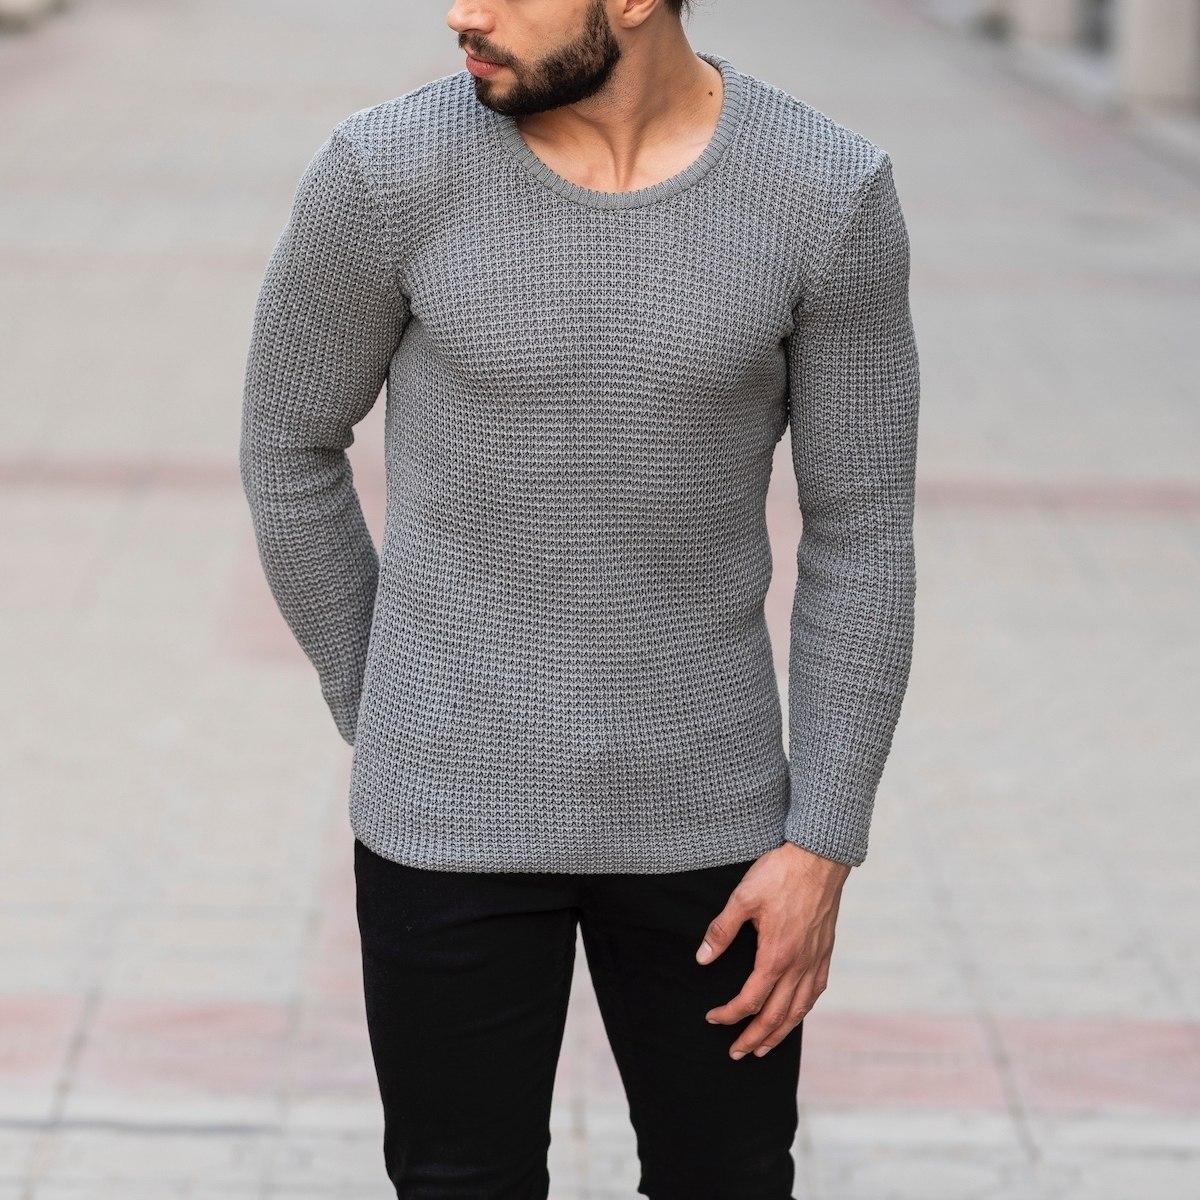 Knitted Pullover In Gray Mv Premium Brand - 3